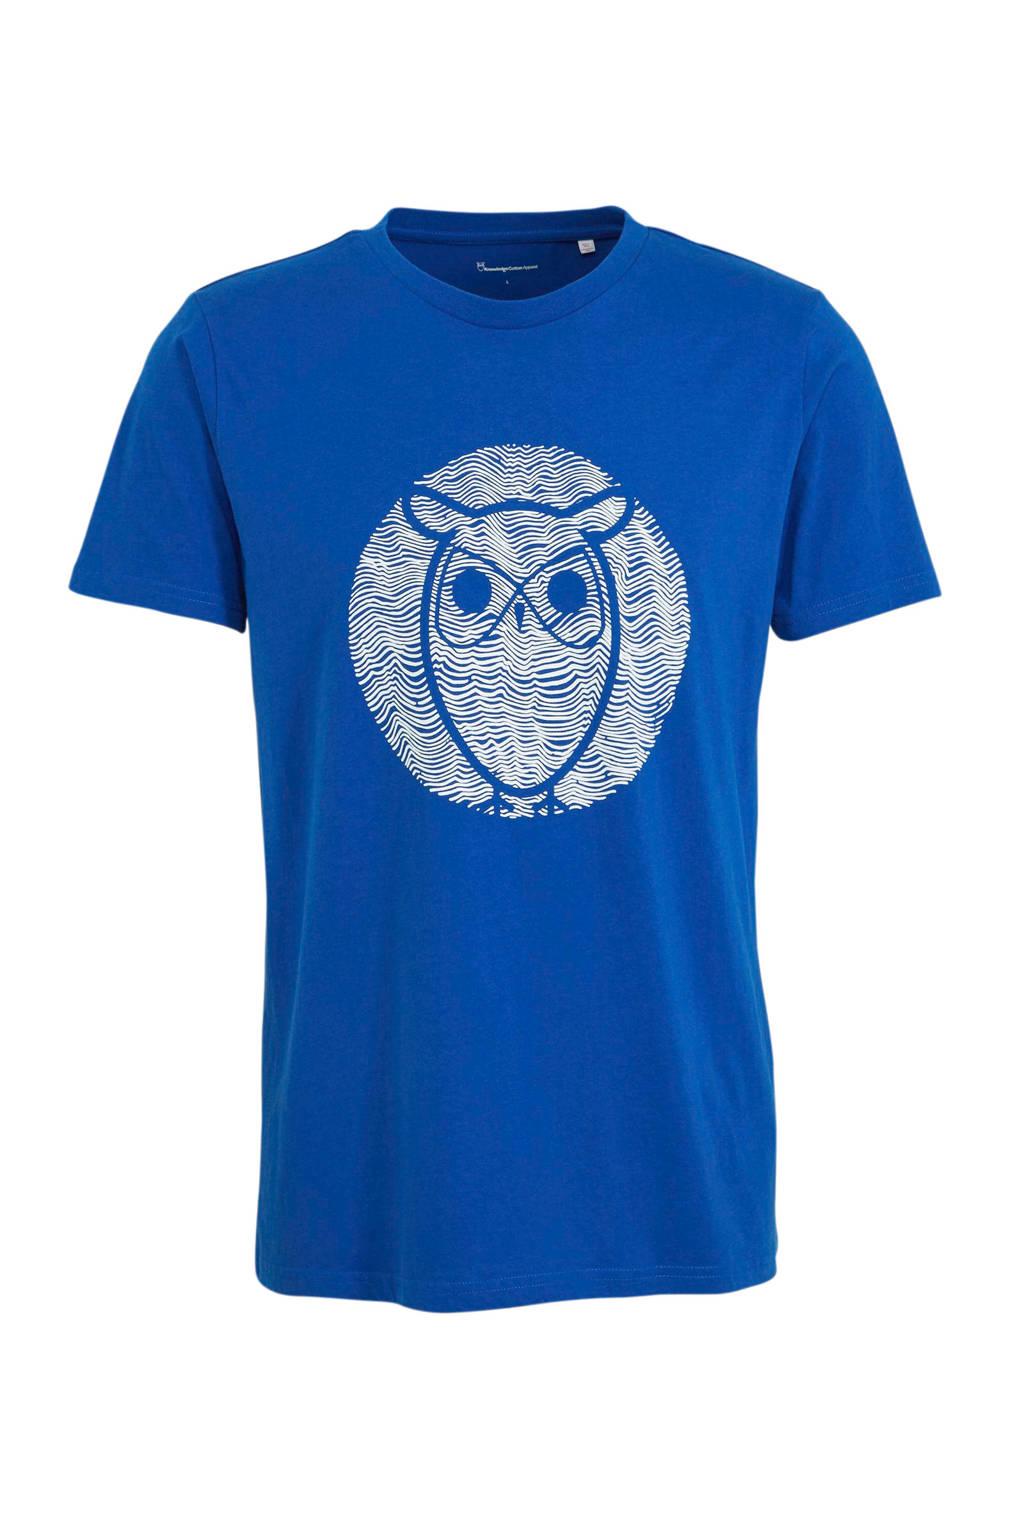 Knowledge Cotton Apparel T-shirt met printopdruk blauw, Blauw